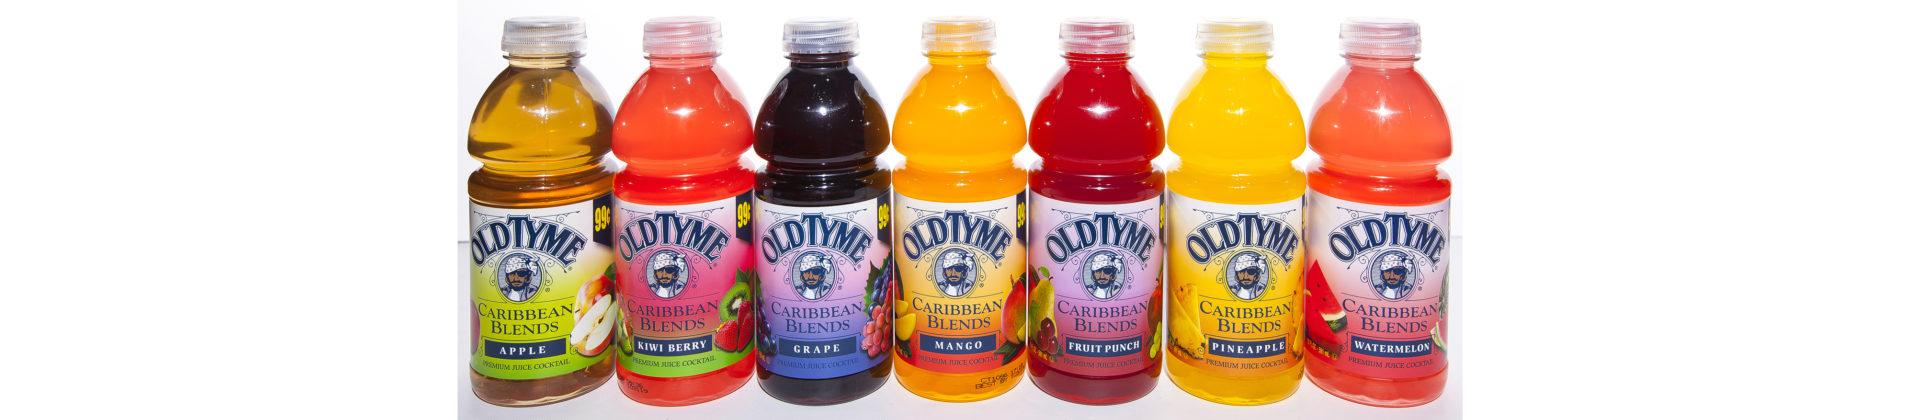 Wades Dairy_OldTyme Soda